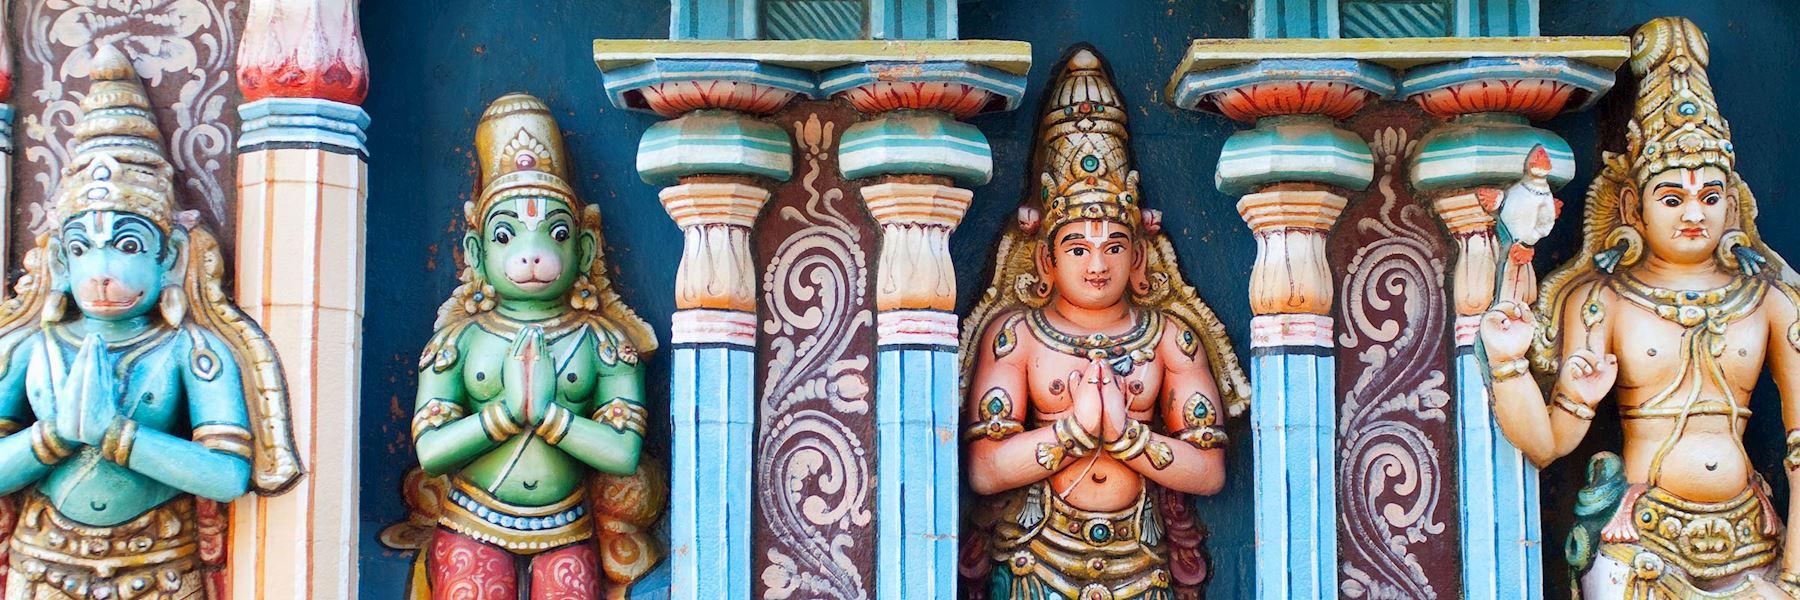 Visit Trichy, India